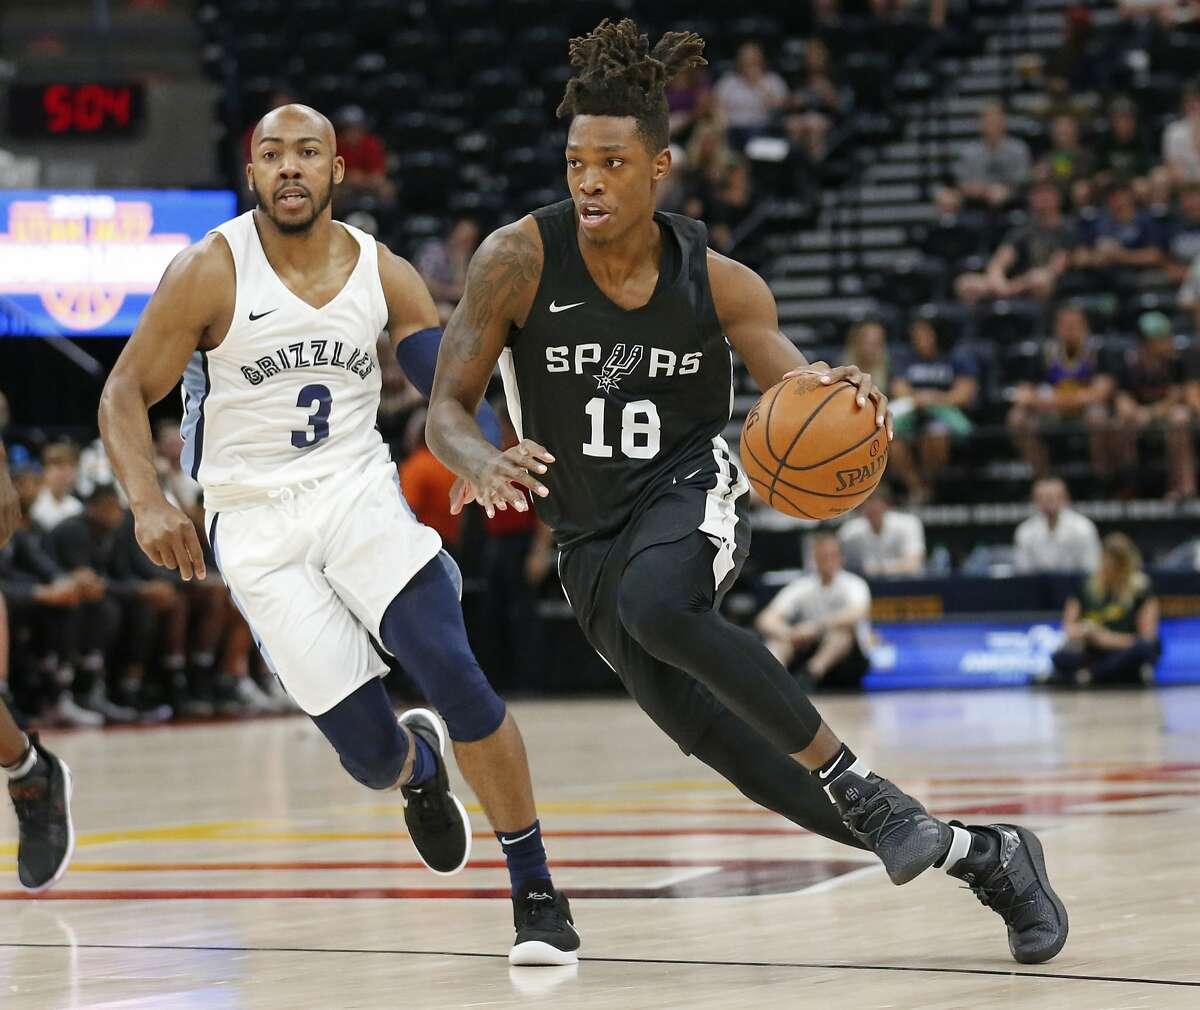 San Antonio Spurs guard Lonnie Walker IV (18) drives as Memphis Grizzlies guard Jevon Carter (3) trails during the first half of an NBA summer league basketball game Thursday, July 5, 2018, in Salt Lake City. (AP Photo/Rick Bowmer)